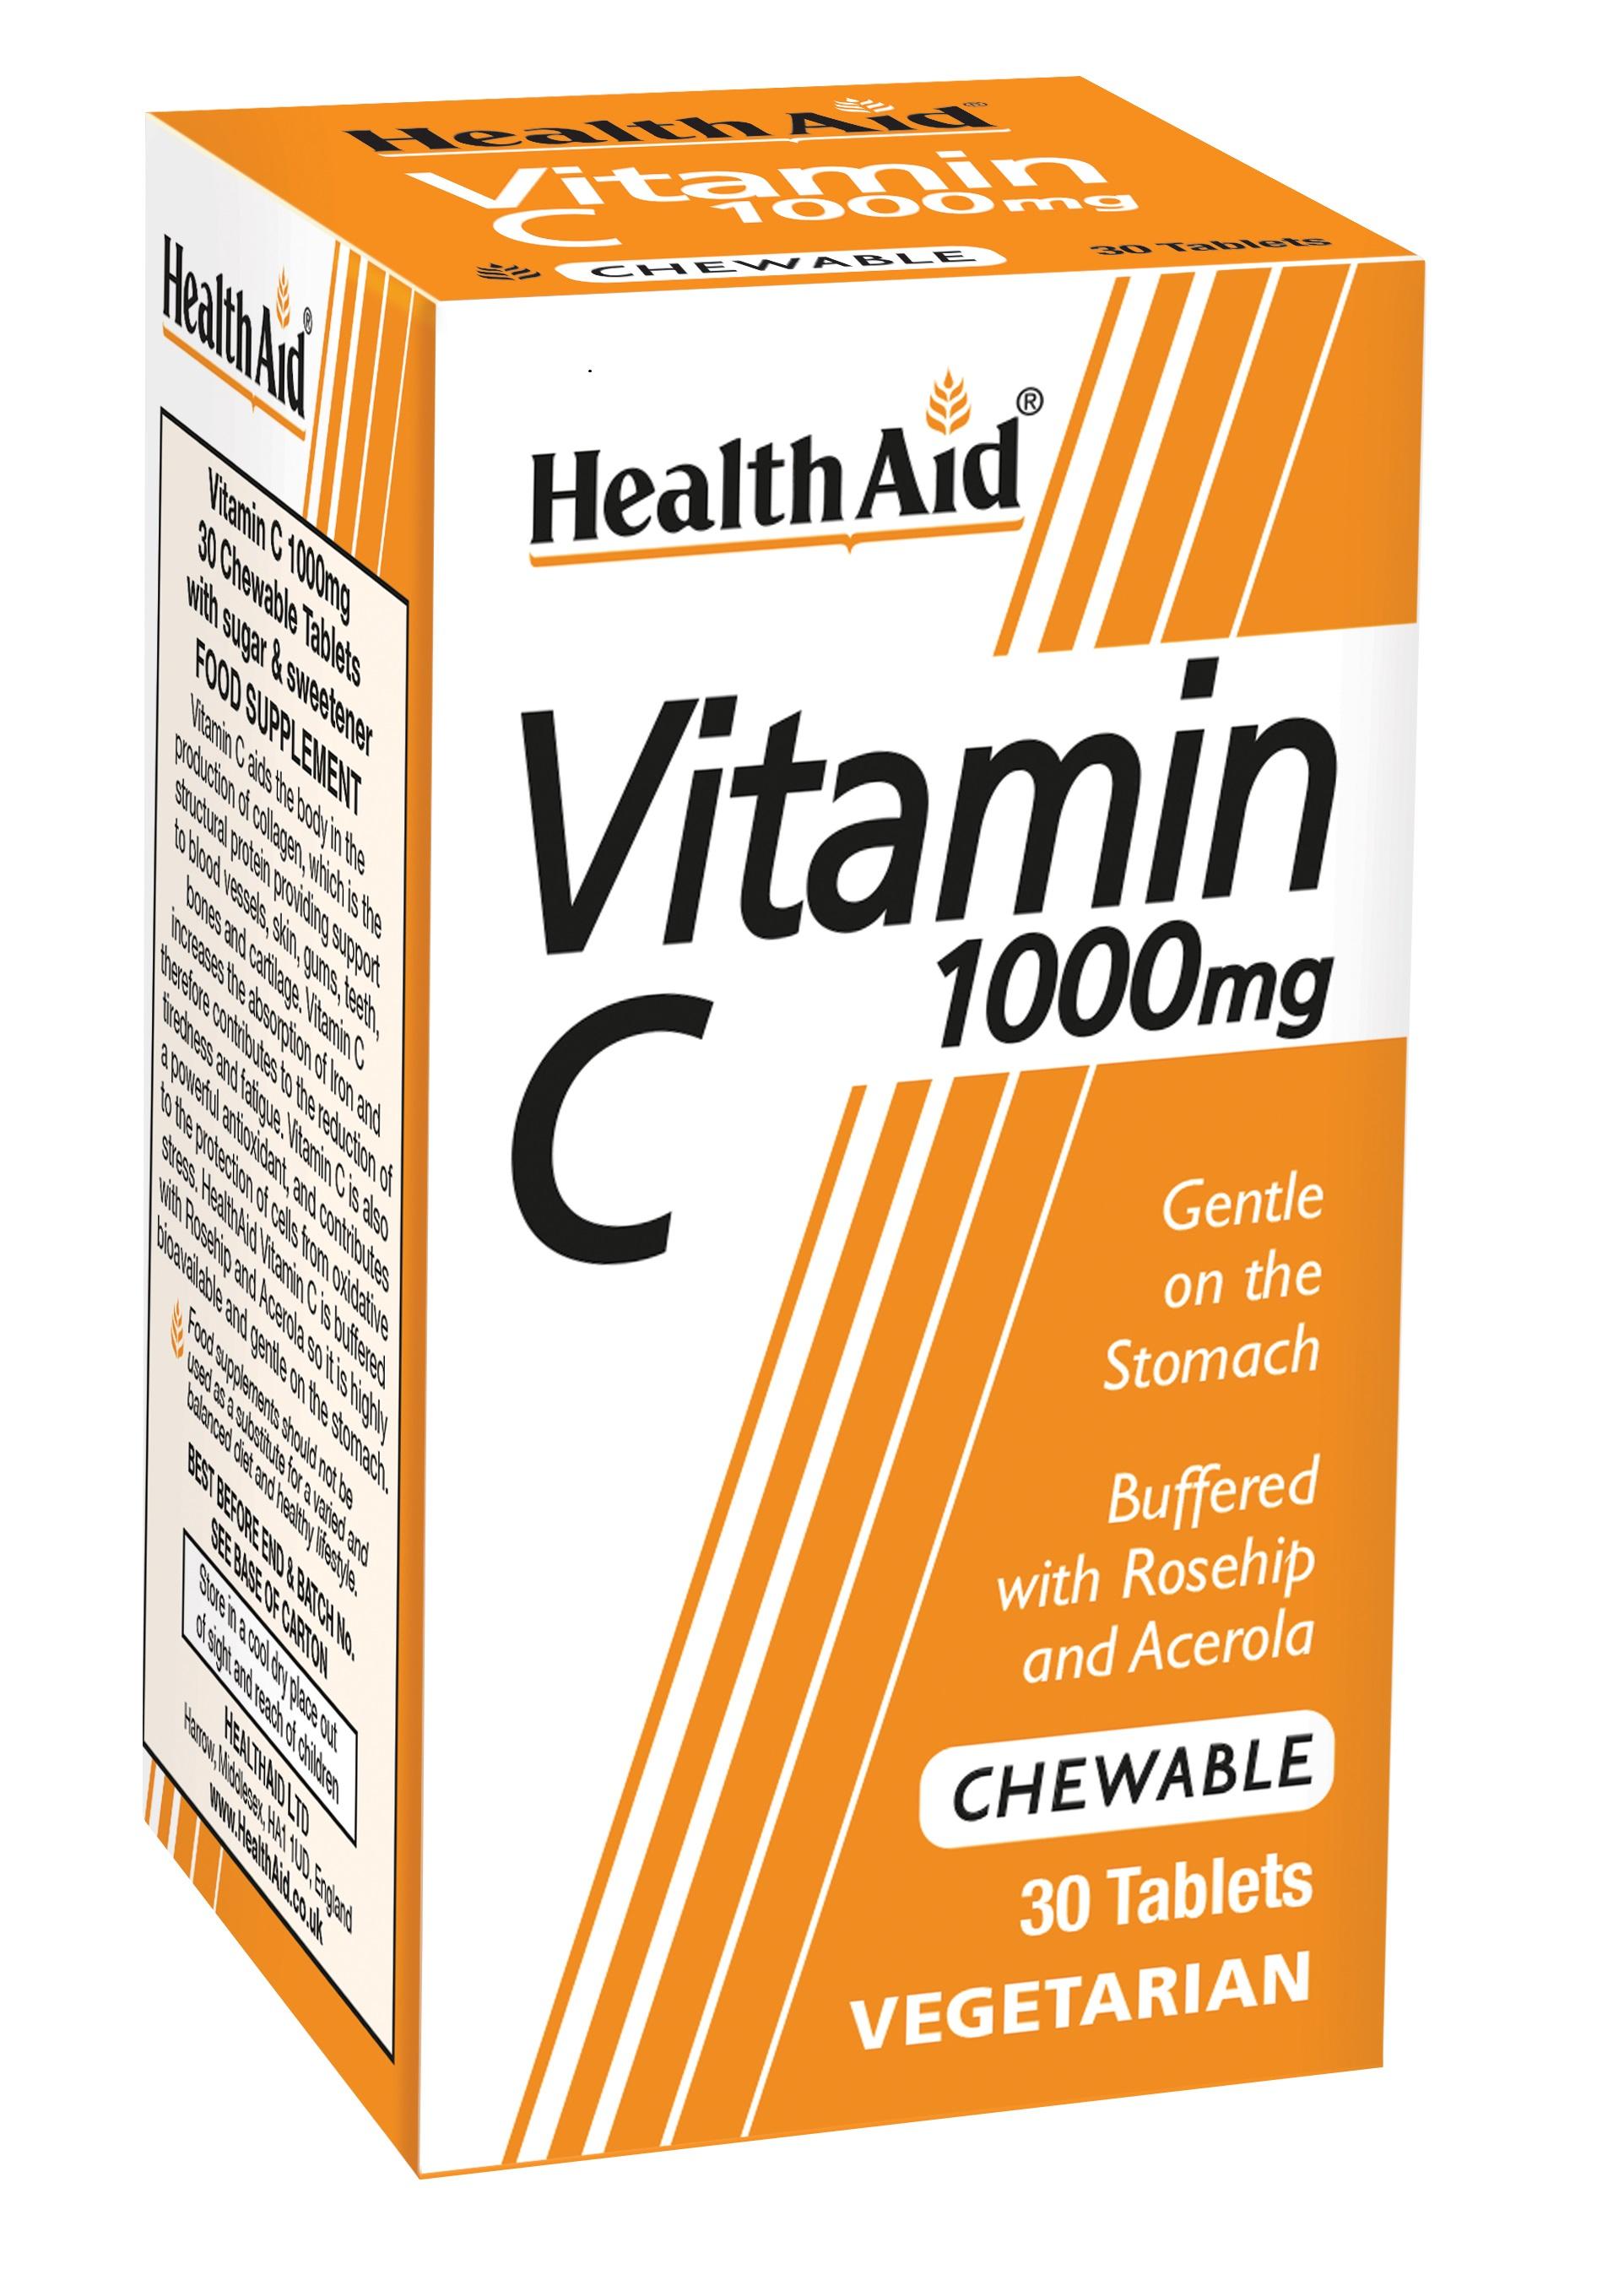 Vitamin C 1000mg Chewable Orange Flavour 30's